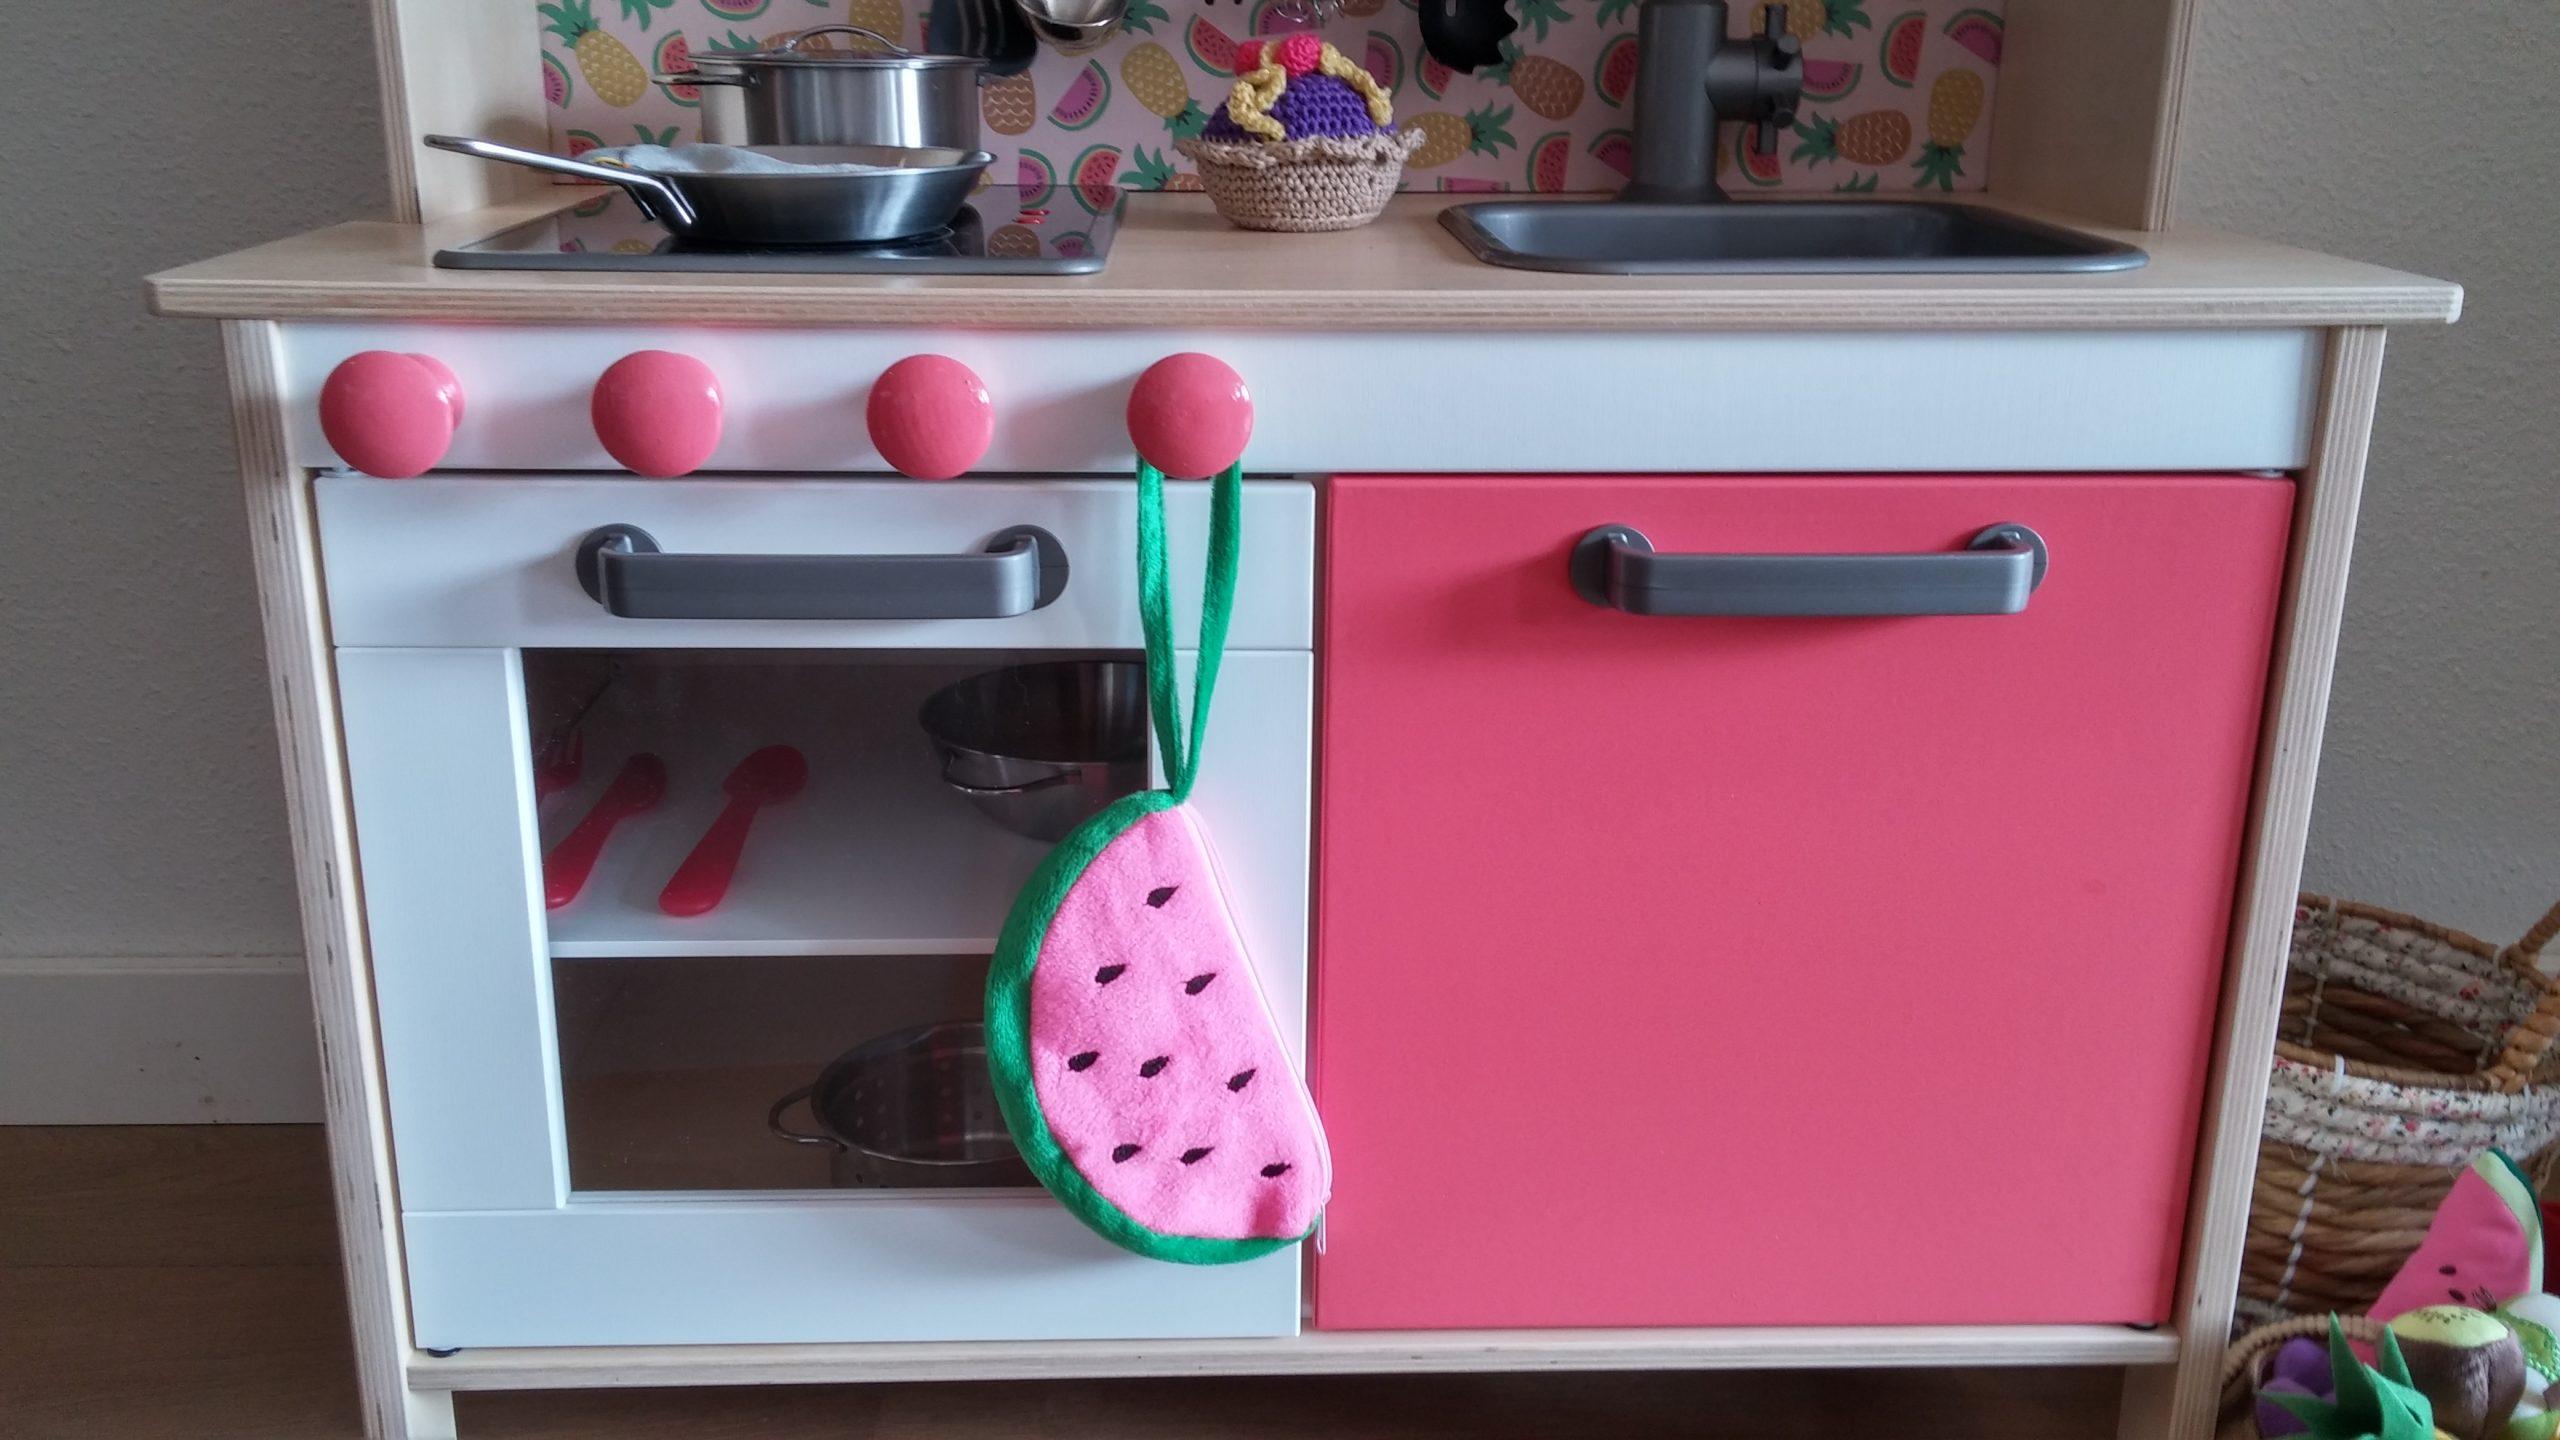 Keuken Verven Ikea : Hoe pimp je een ikea speelgoedkeukentje u dotjes